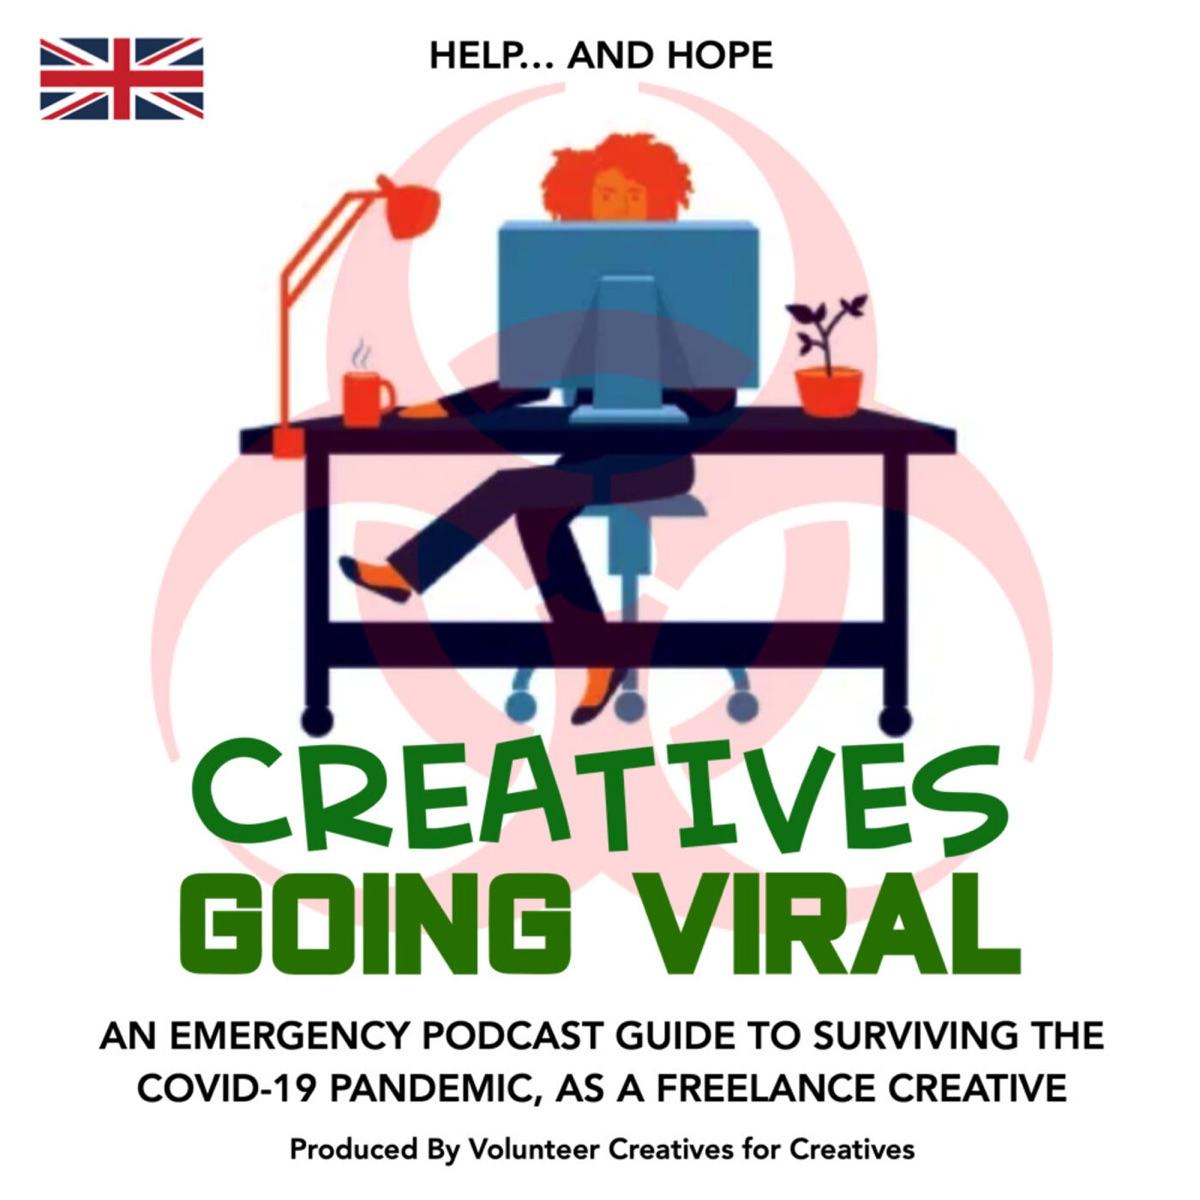 Creatives Going Viral